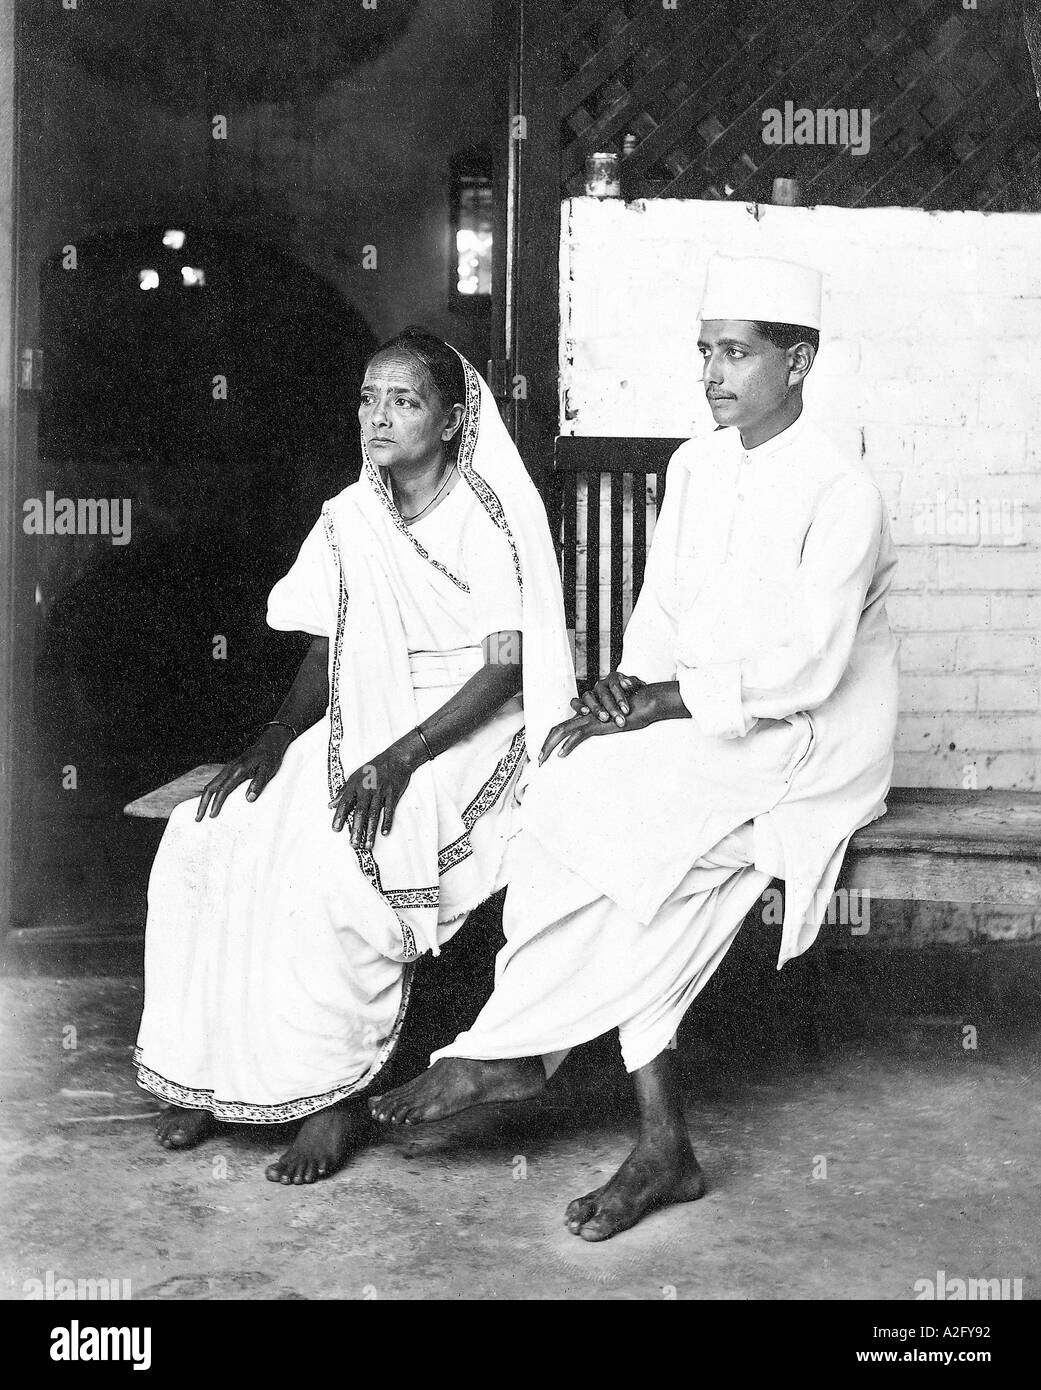 MKG32981 Kasturba Gandhi and her son Ramdas at Sabarmati Ashram Ahmedabad Gujarat India 1920 - Stock Image